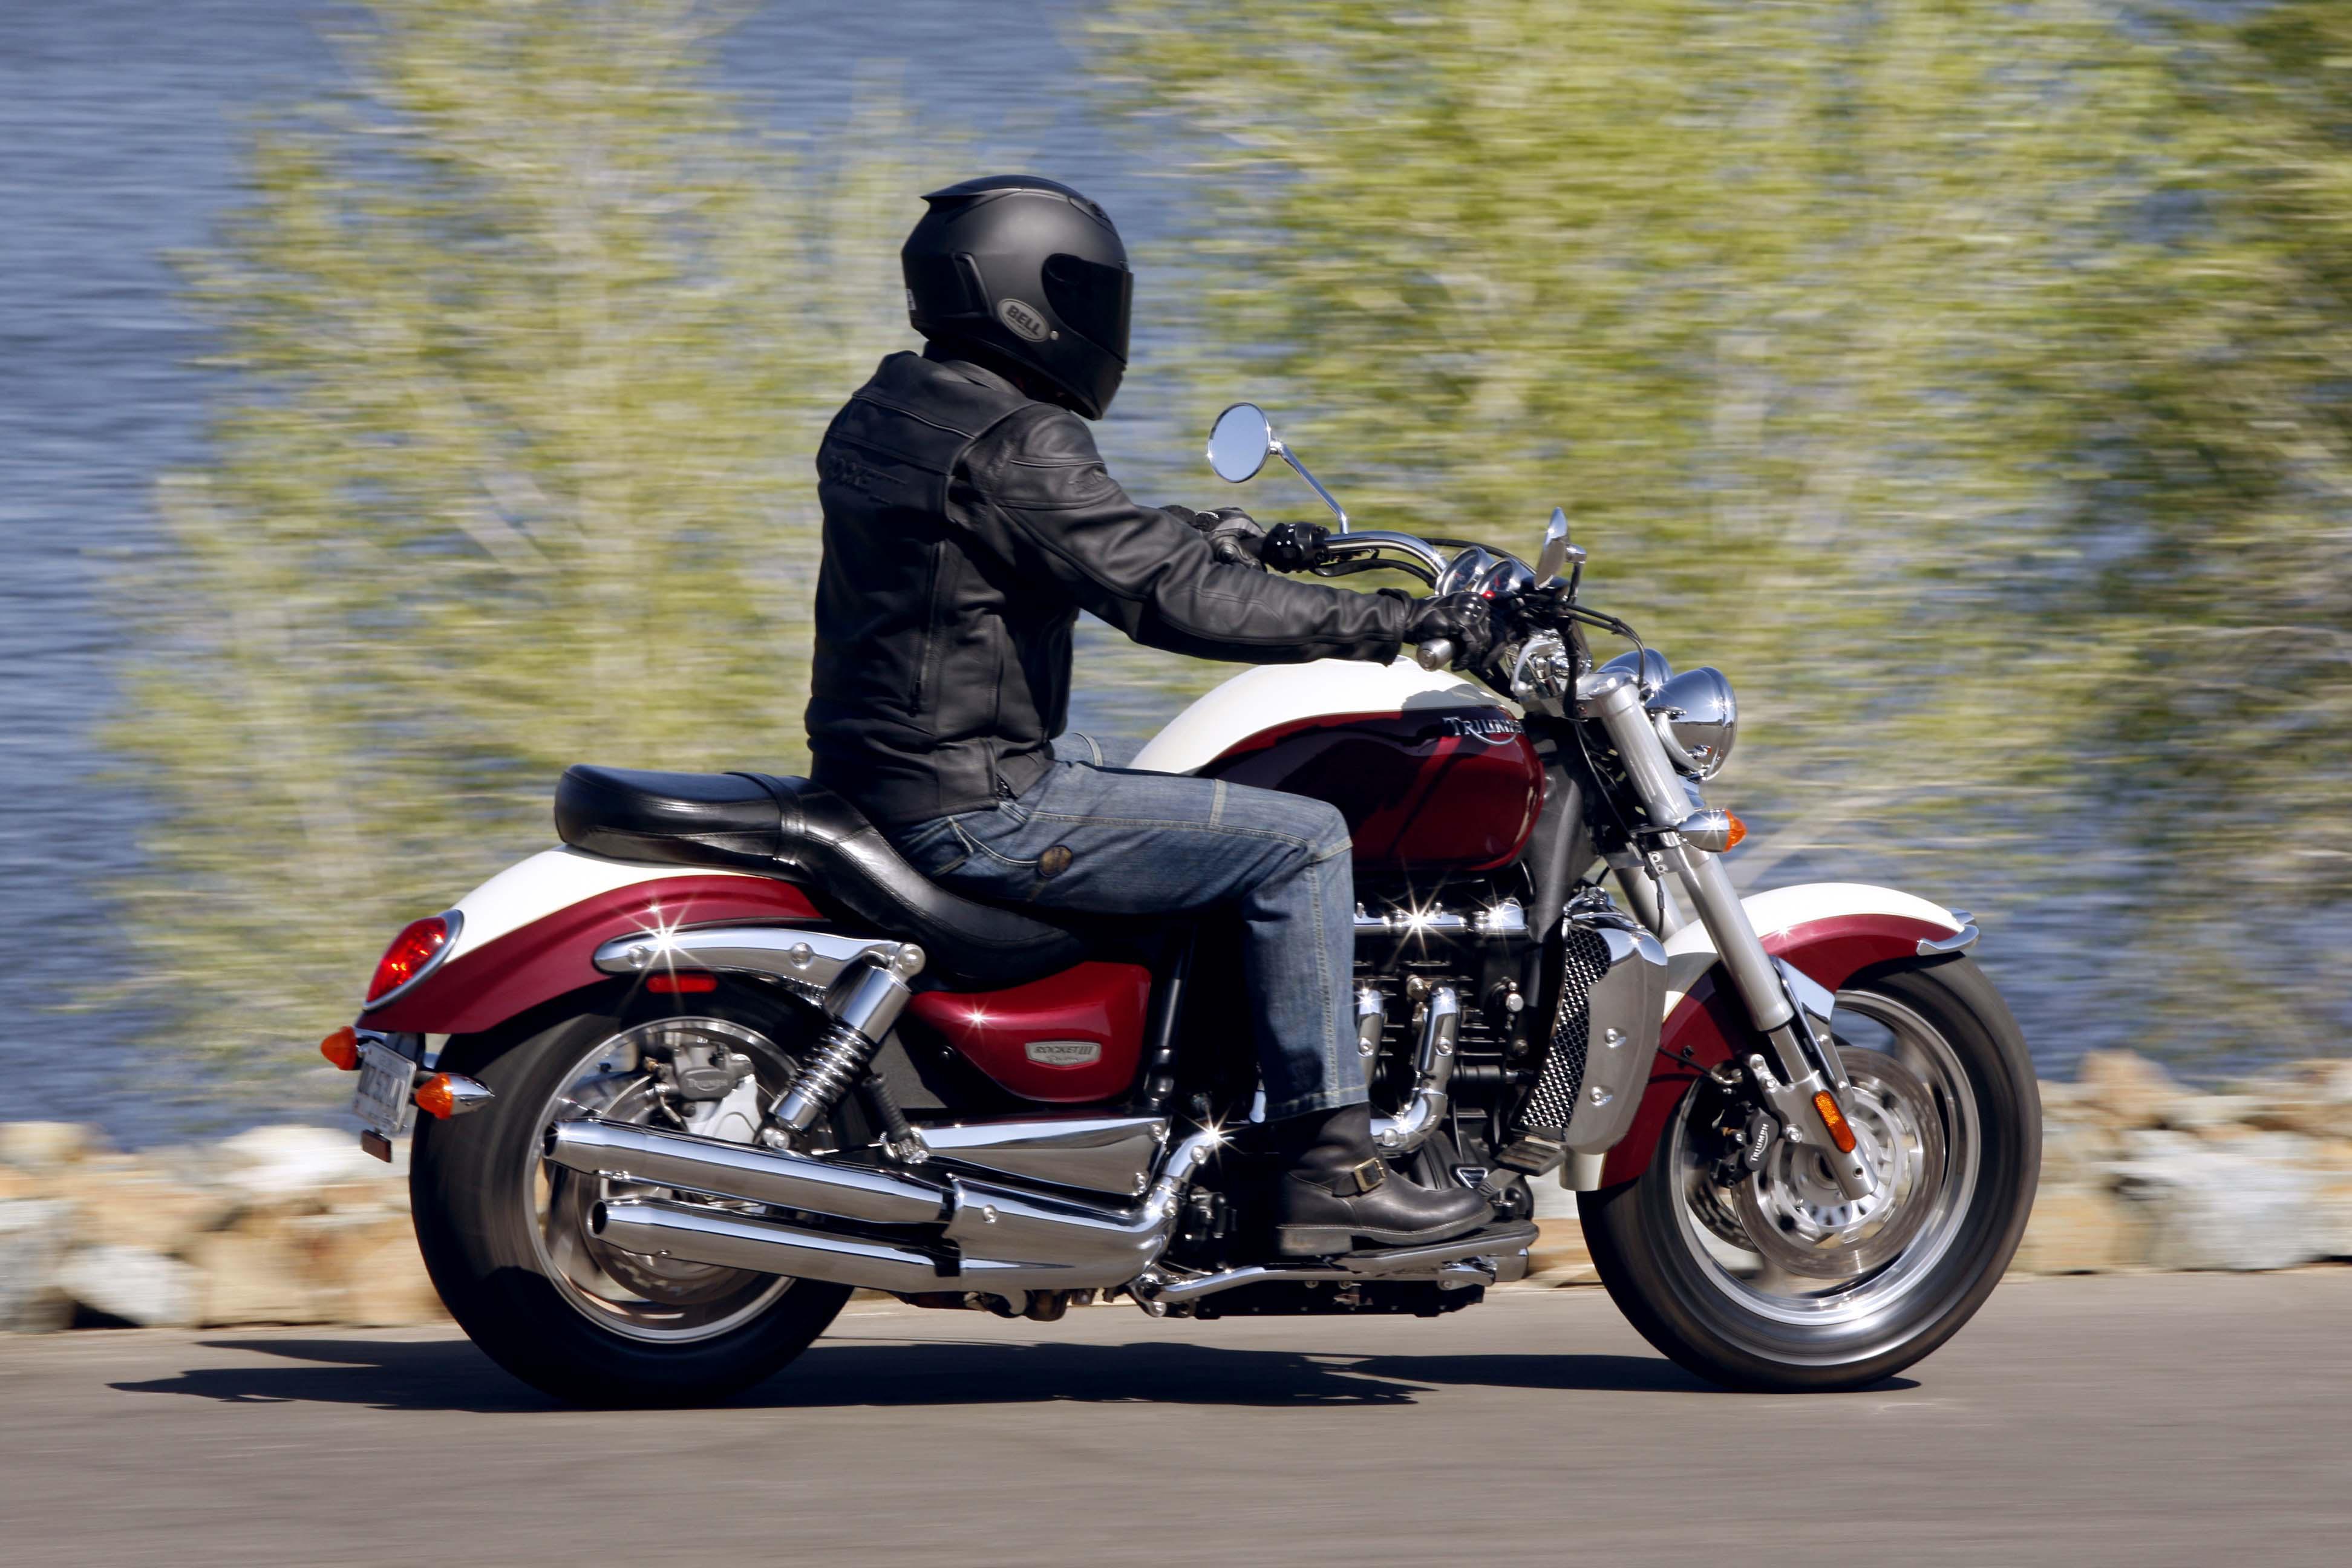 First Ride: 2006 Triumph Rocket III Classic | Visordown